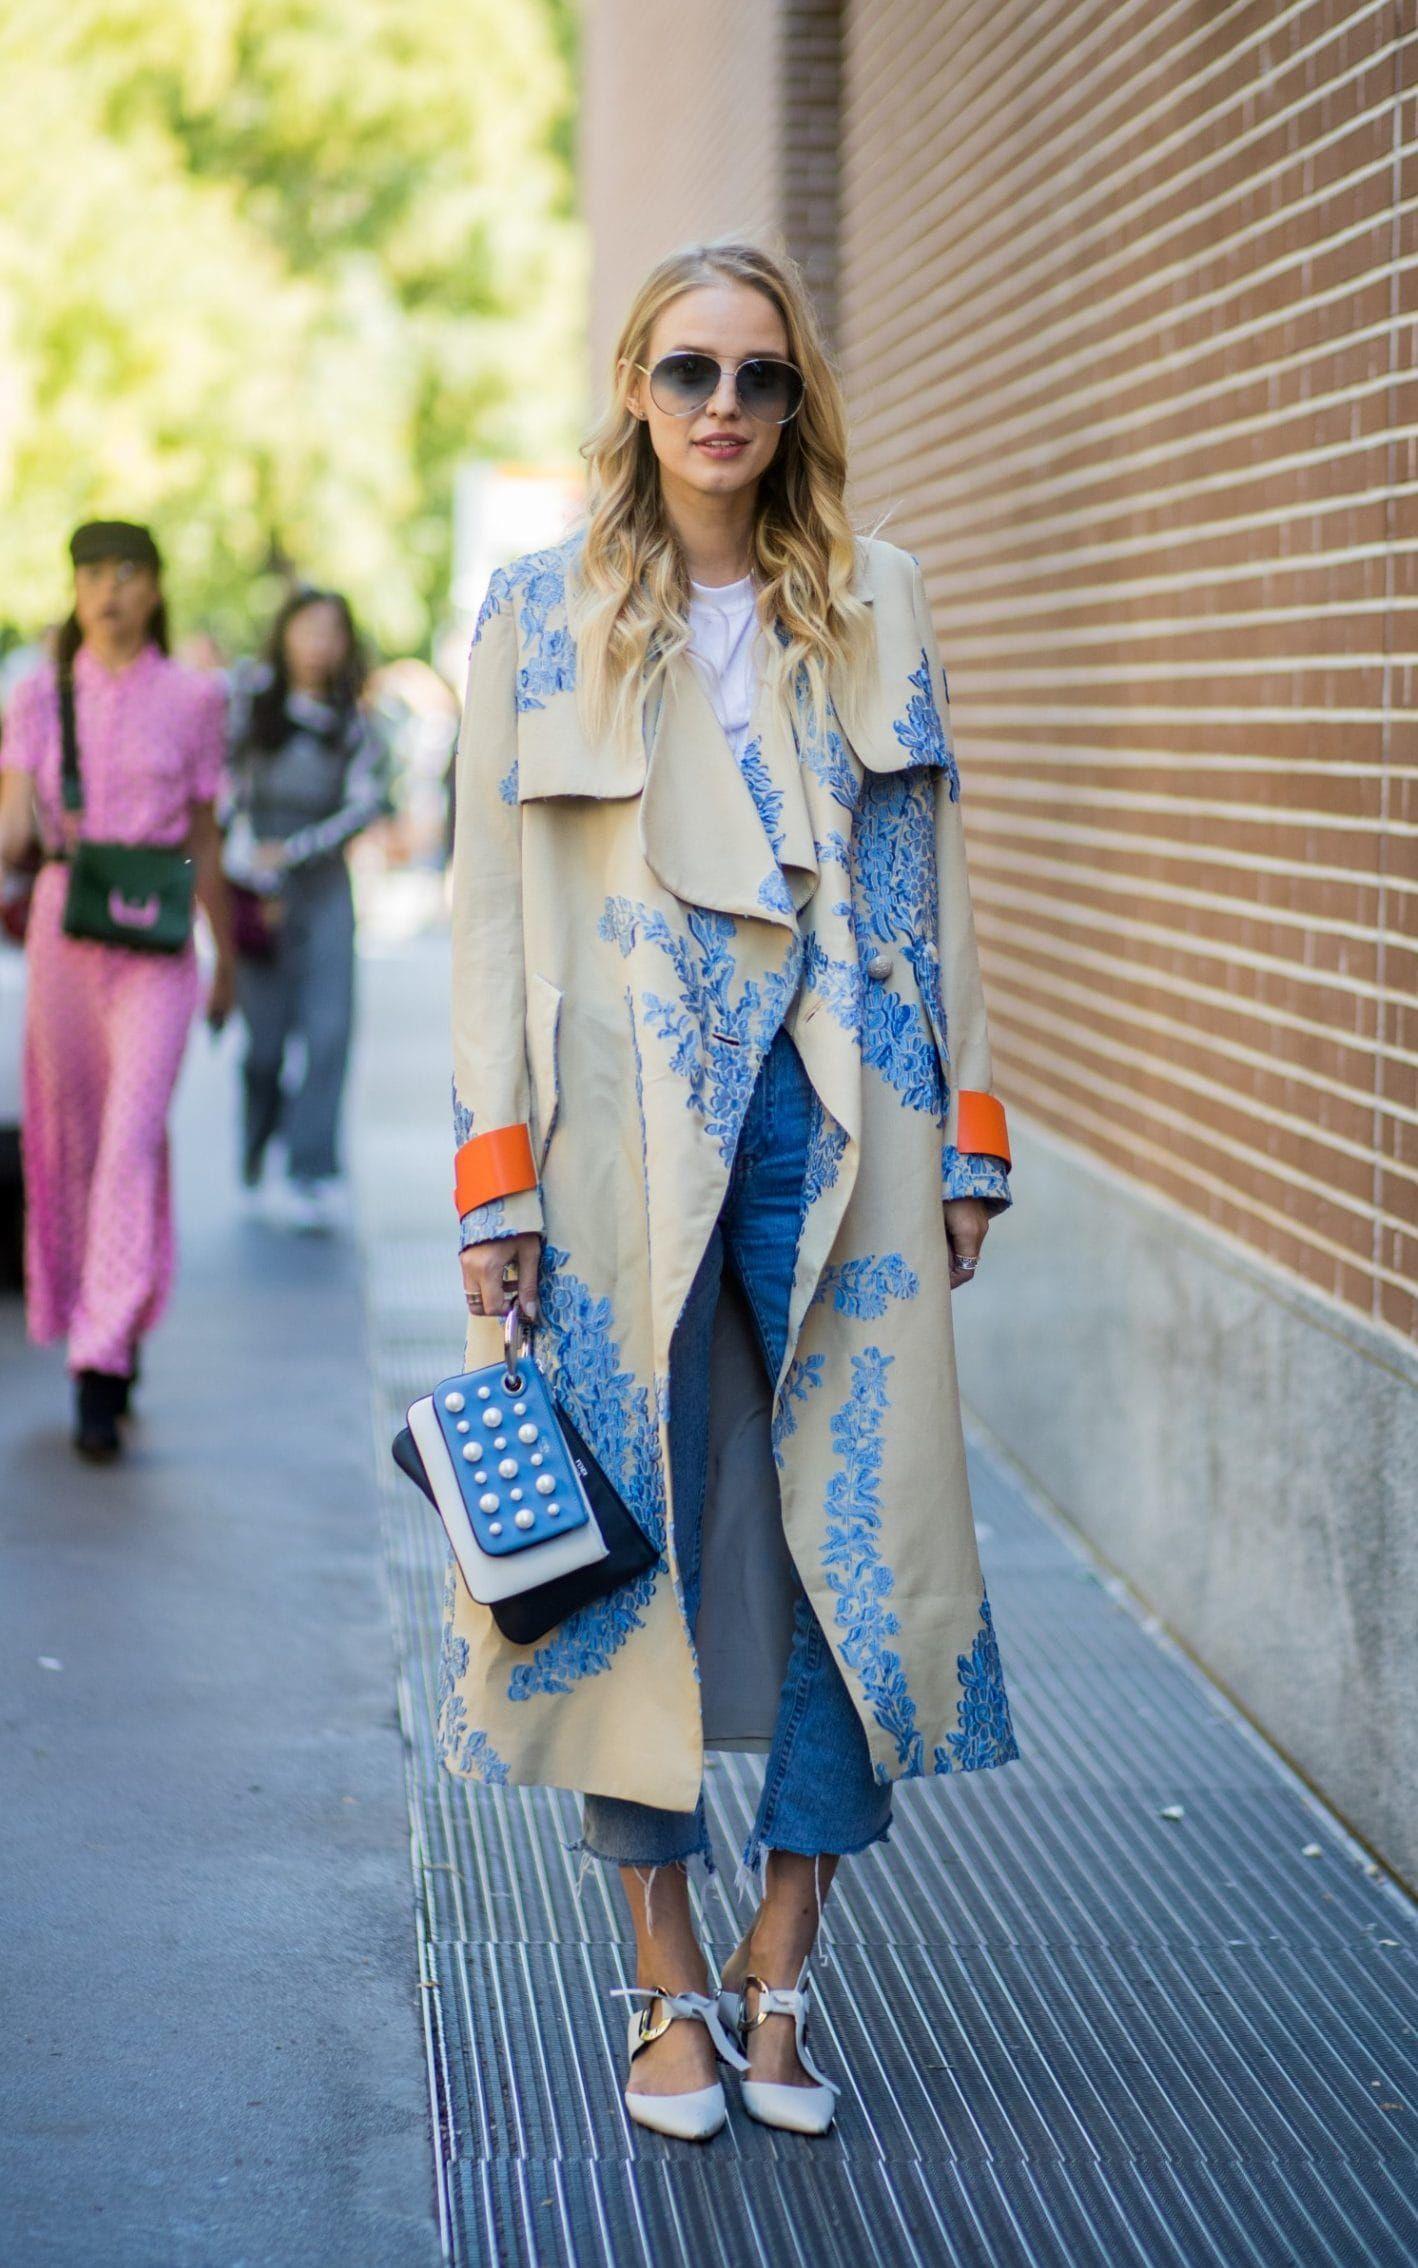 MFW SS18: Os Melhores Looks de Street Style - Gabi May